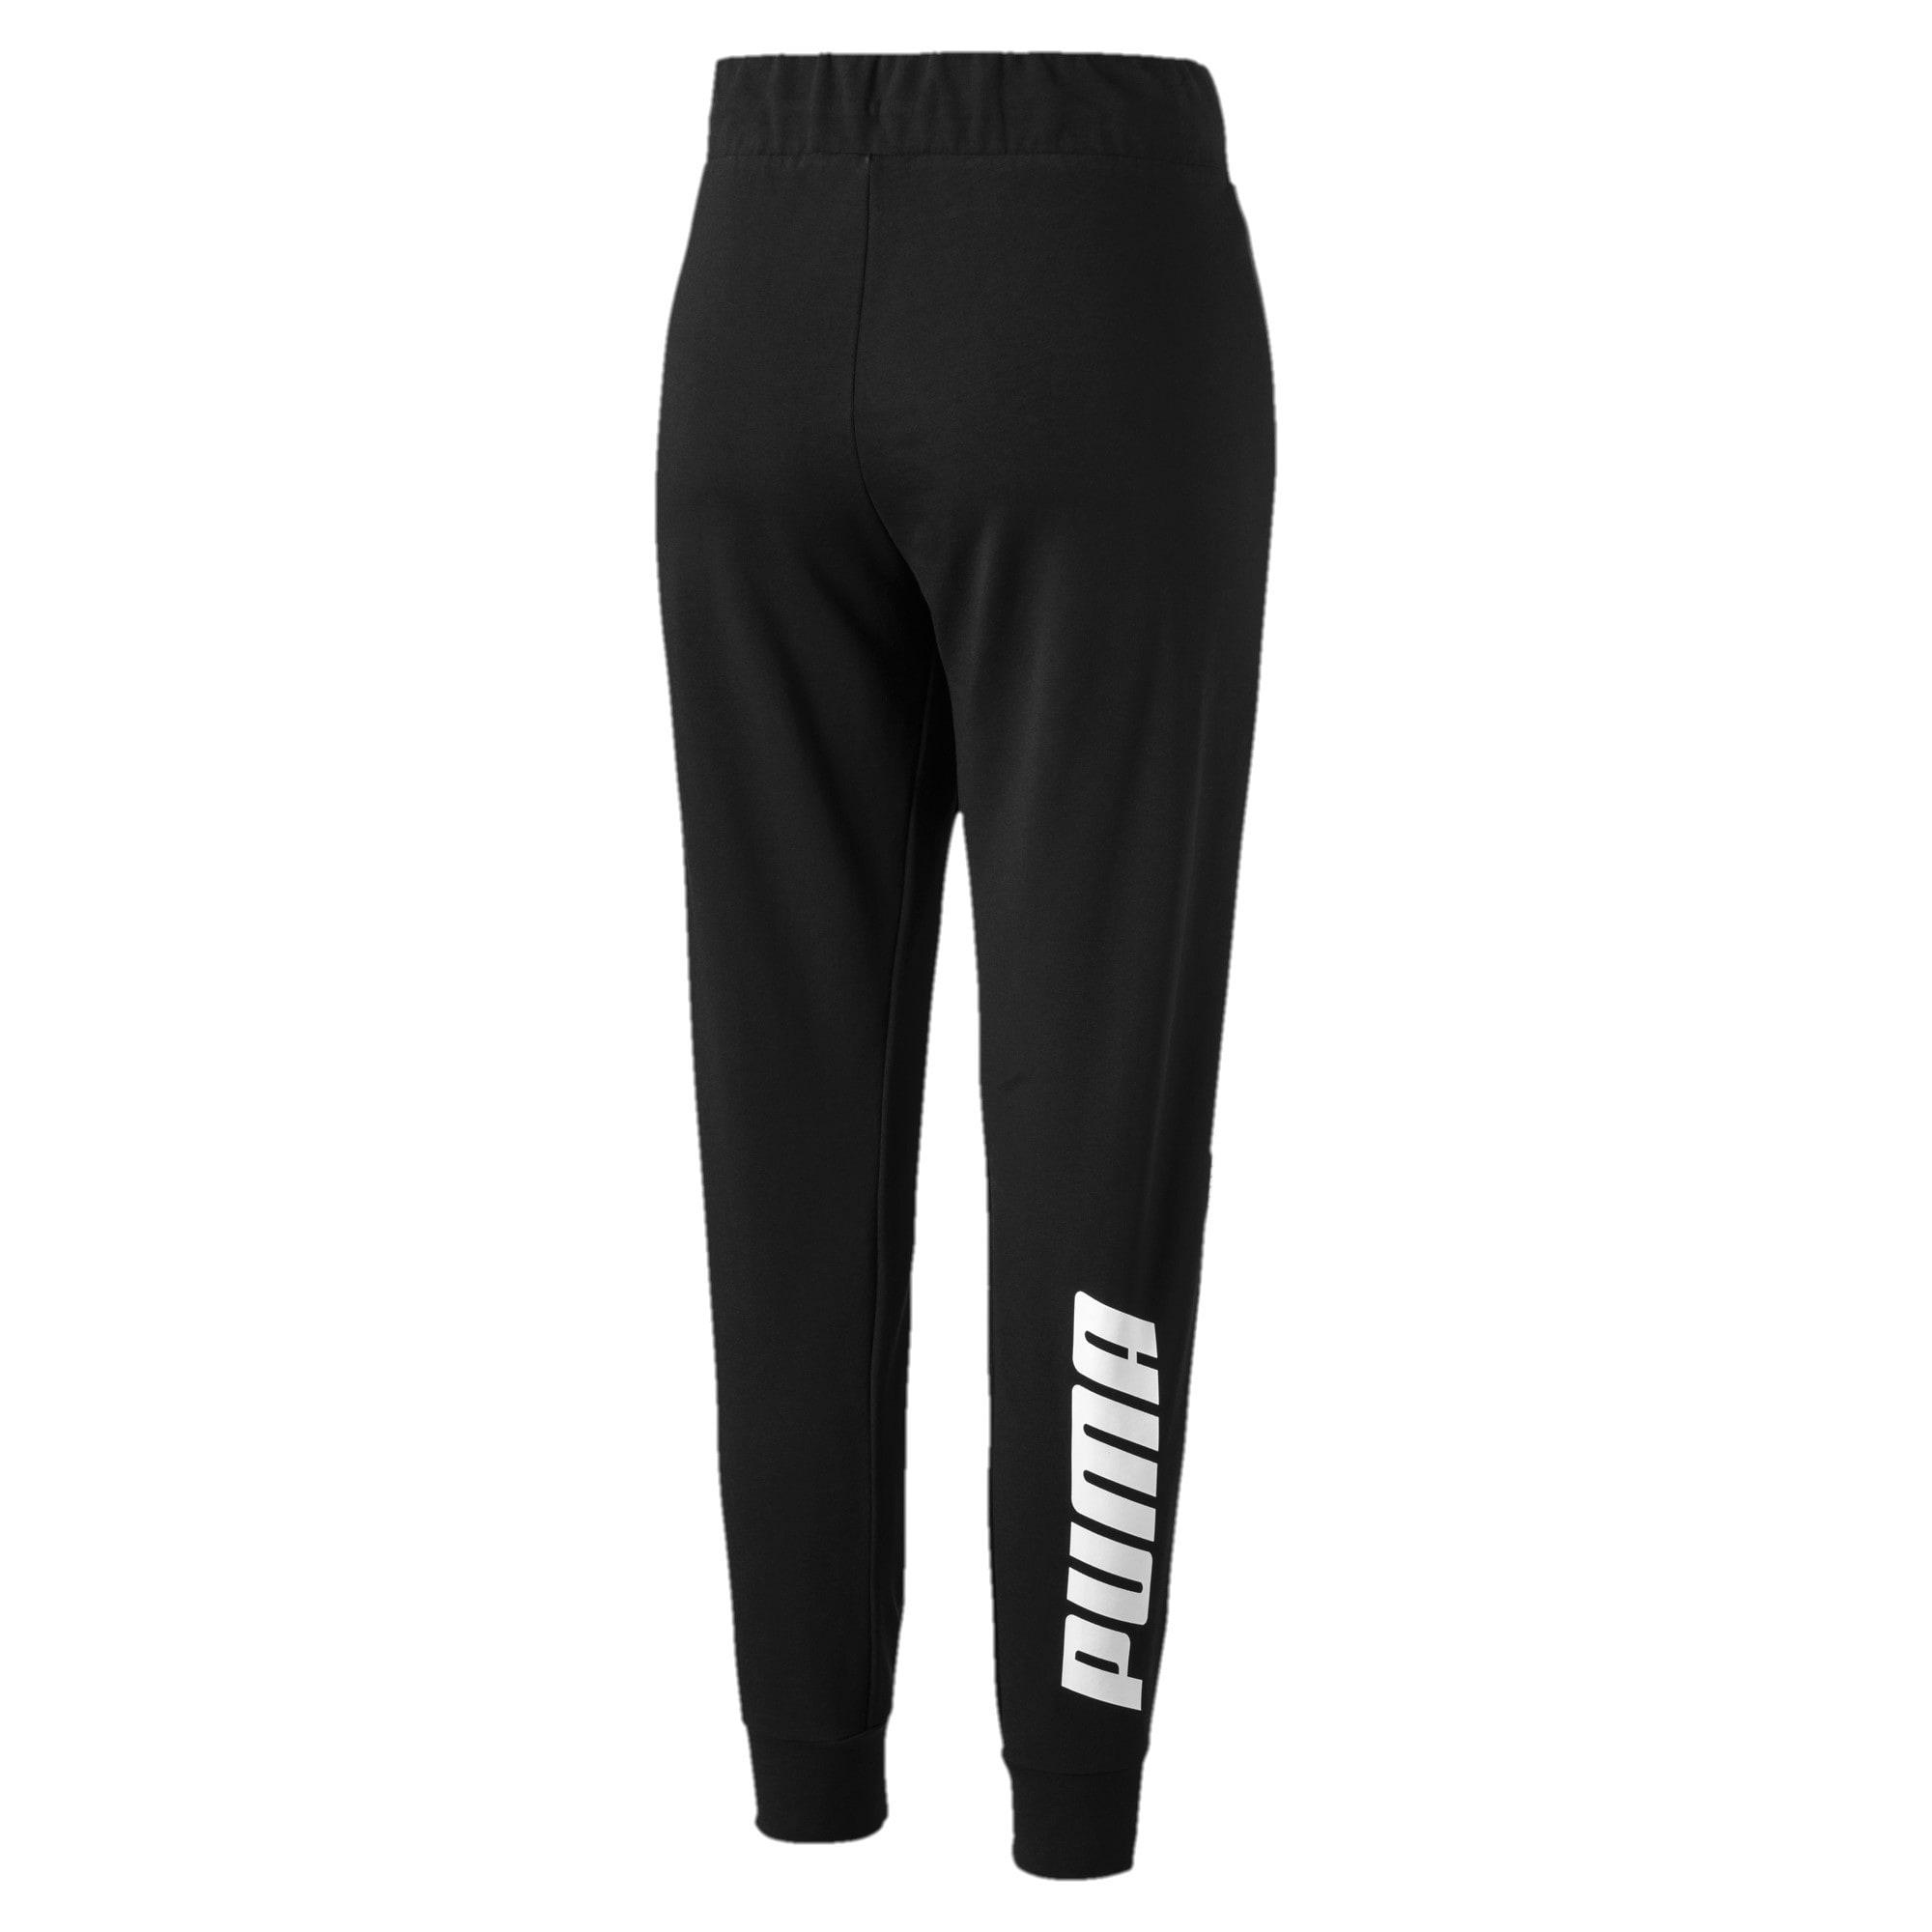 Thumbnail 5 of Modern Sports Pants, Cotton Black, medium